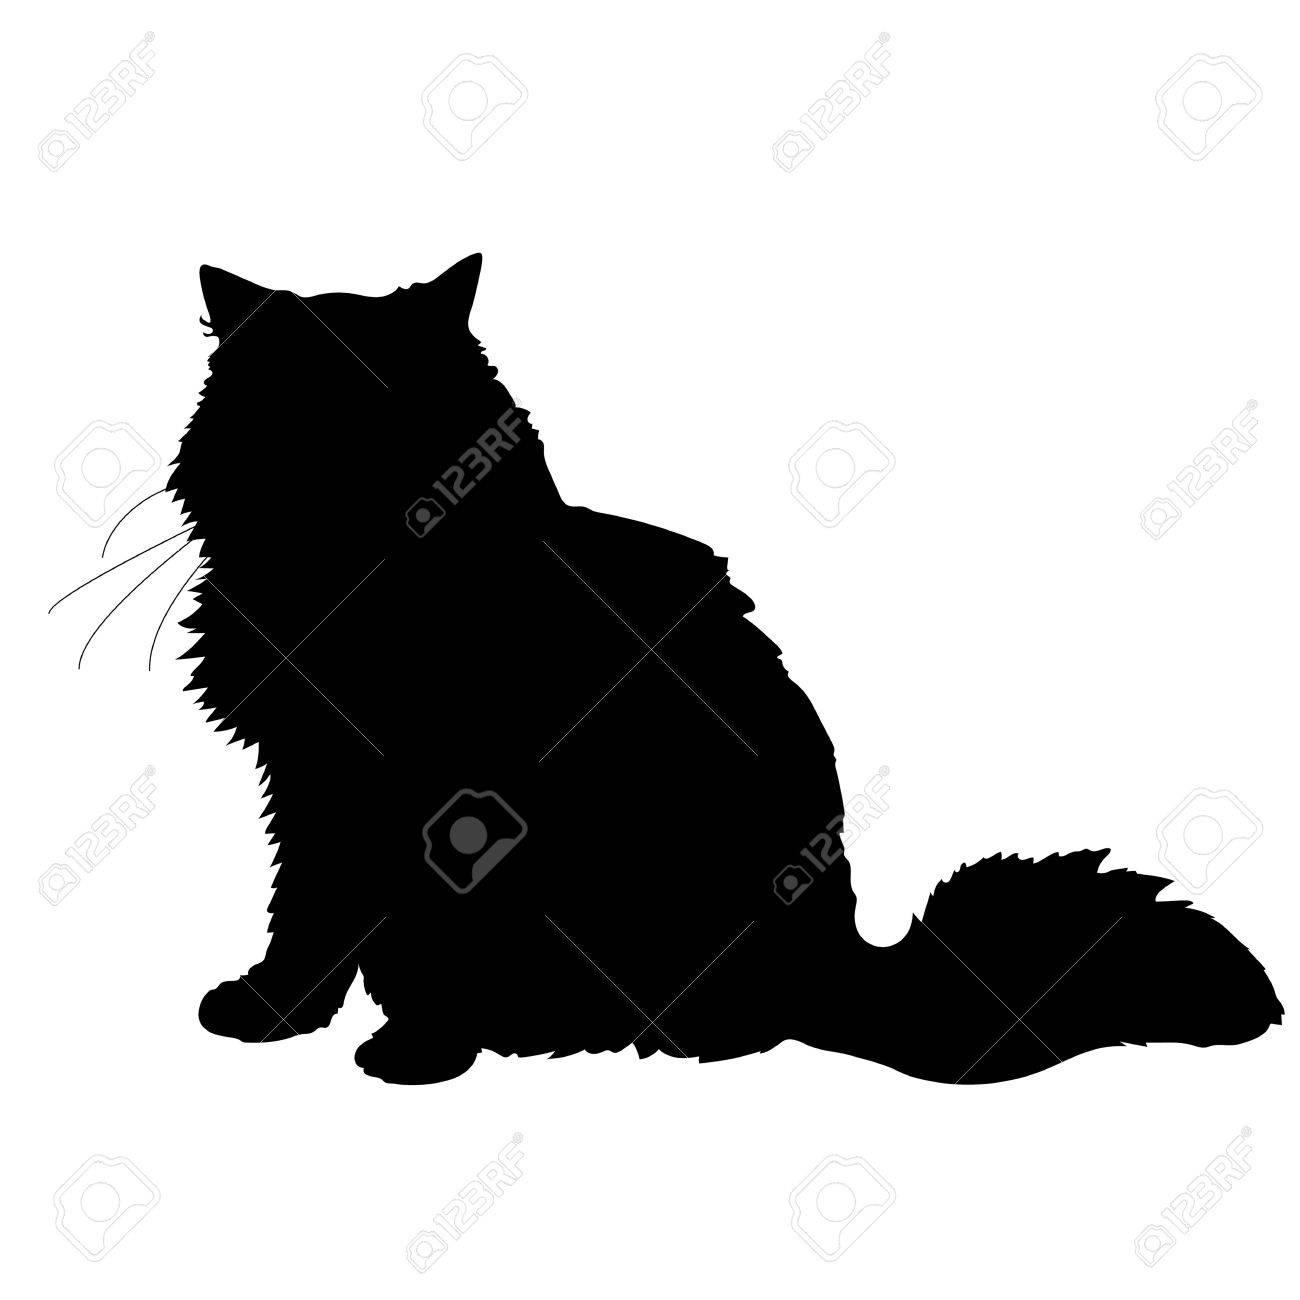 A black silhouette of a cat - 41855414